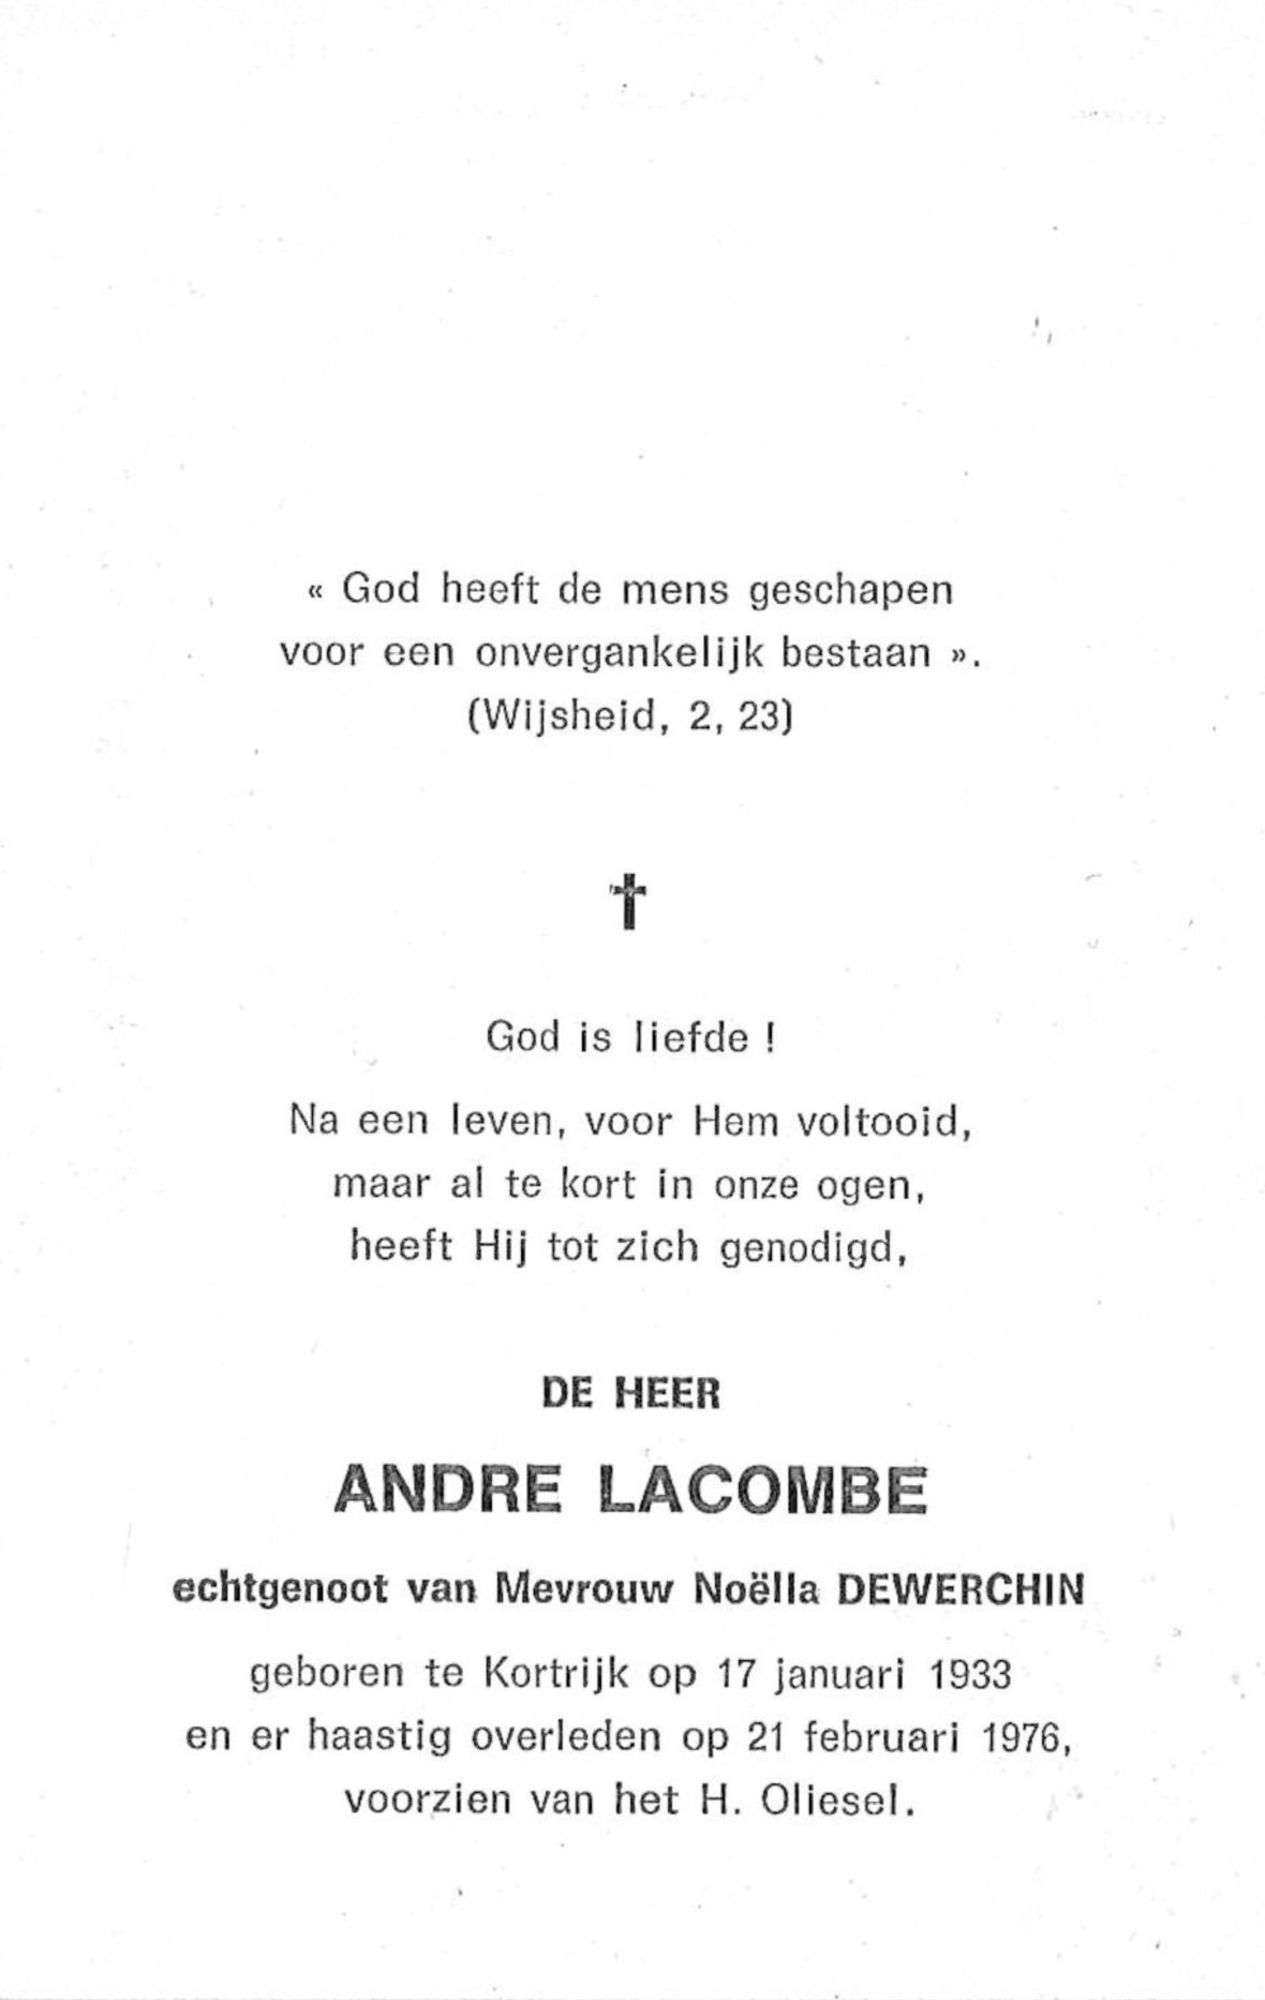 Andre Lacombe